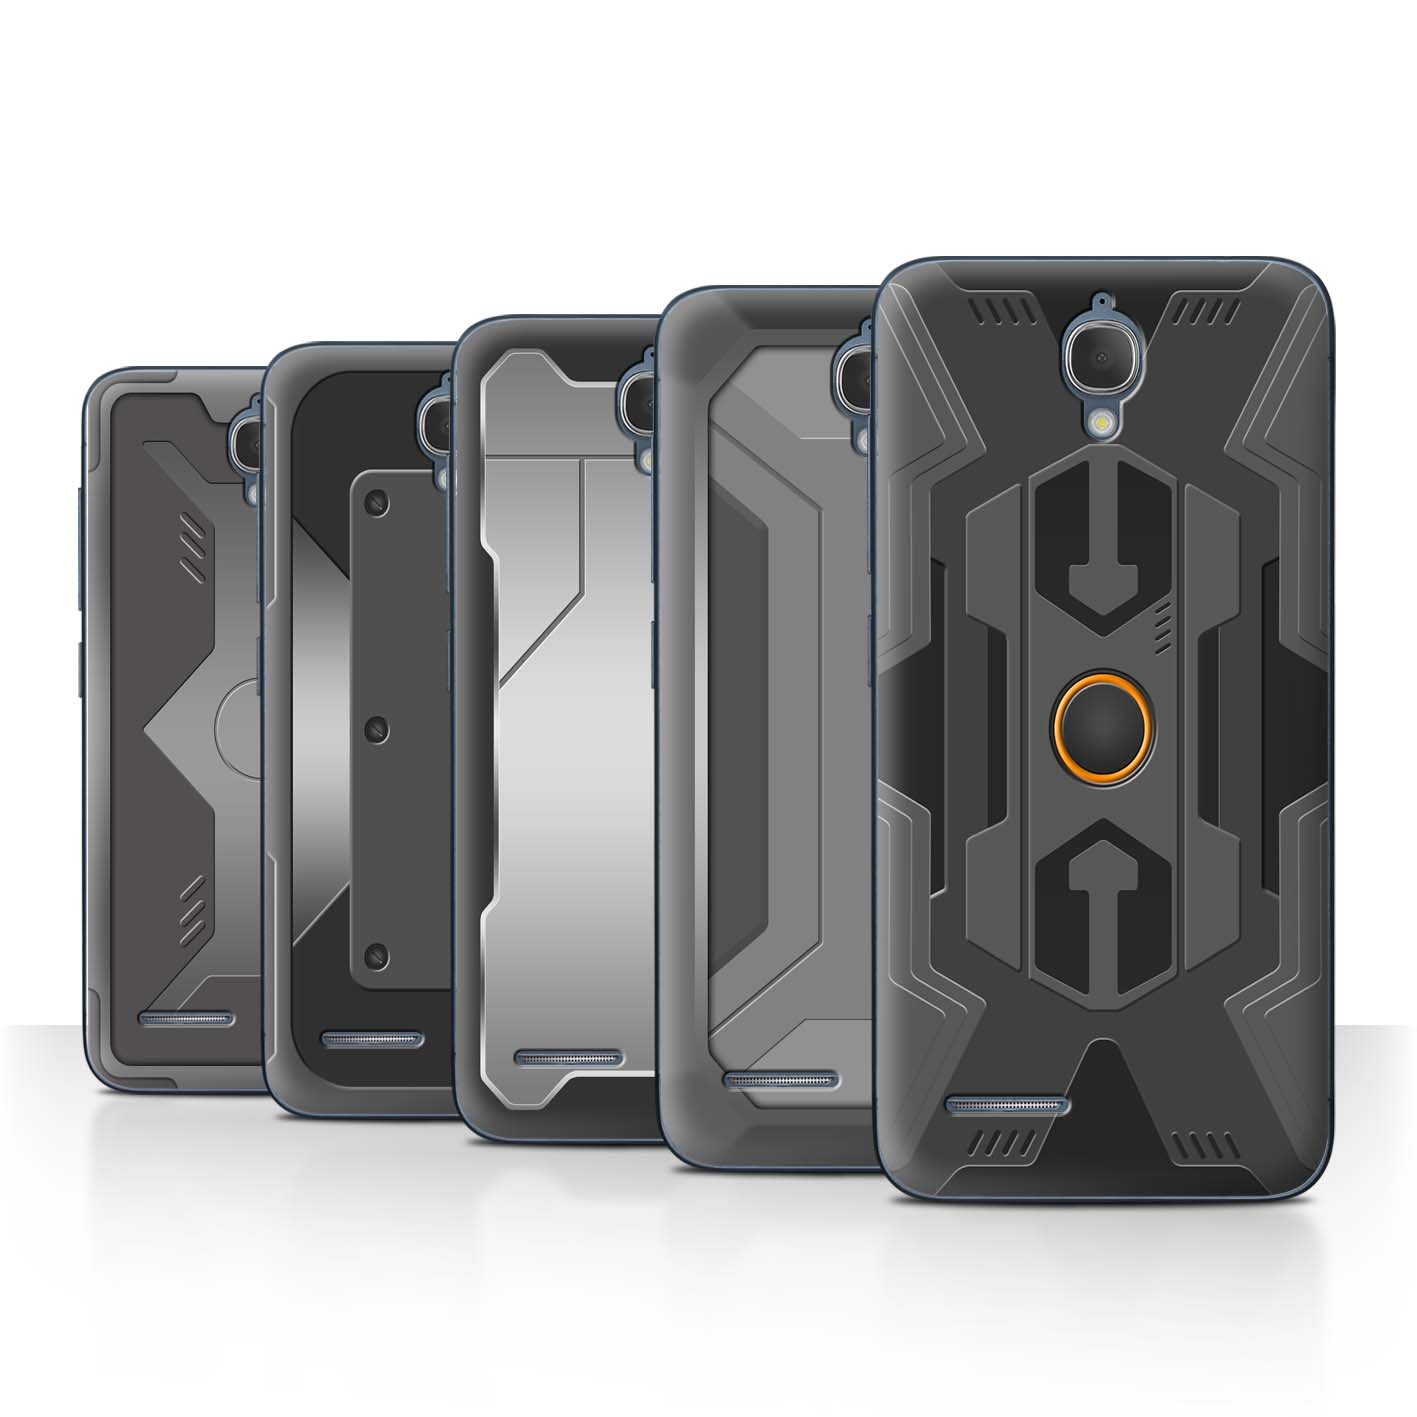 STUFF4-Back-Case-Cover-Skin-for-Alcatel-Idol-2-Mini-Armour-Armor